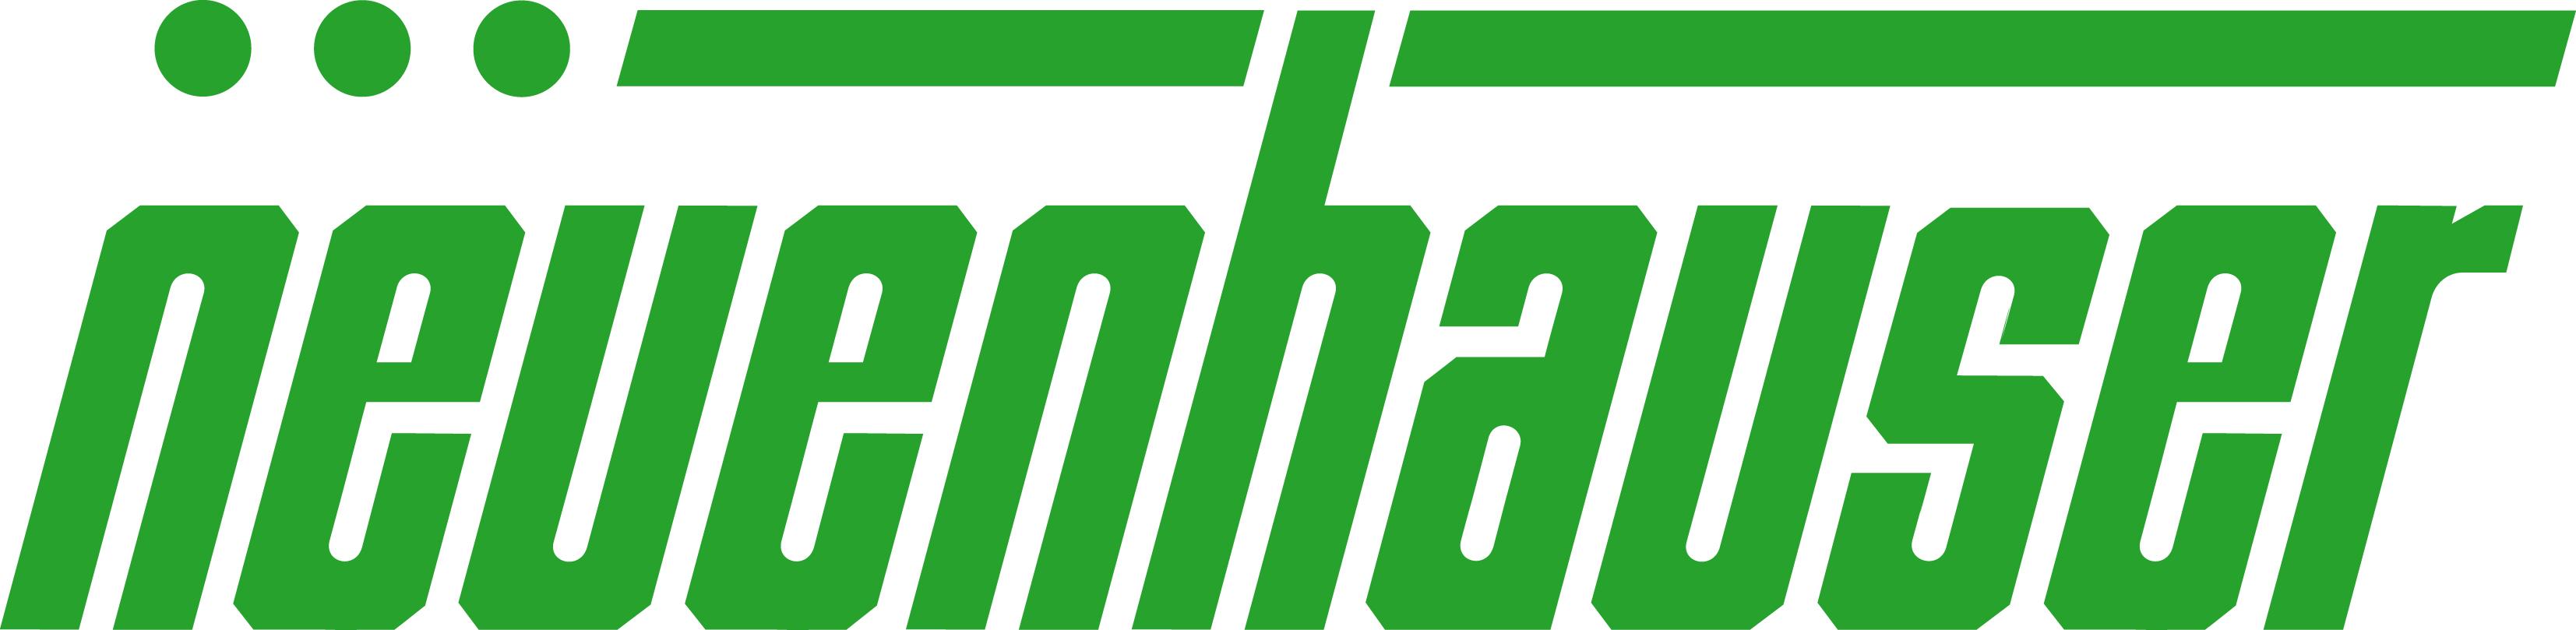 Neuenhauser maschinenbau gmbh qualit tssicherung for Maschinenbau ohne nc